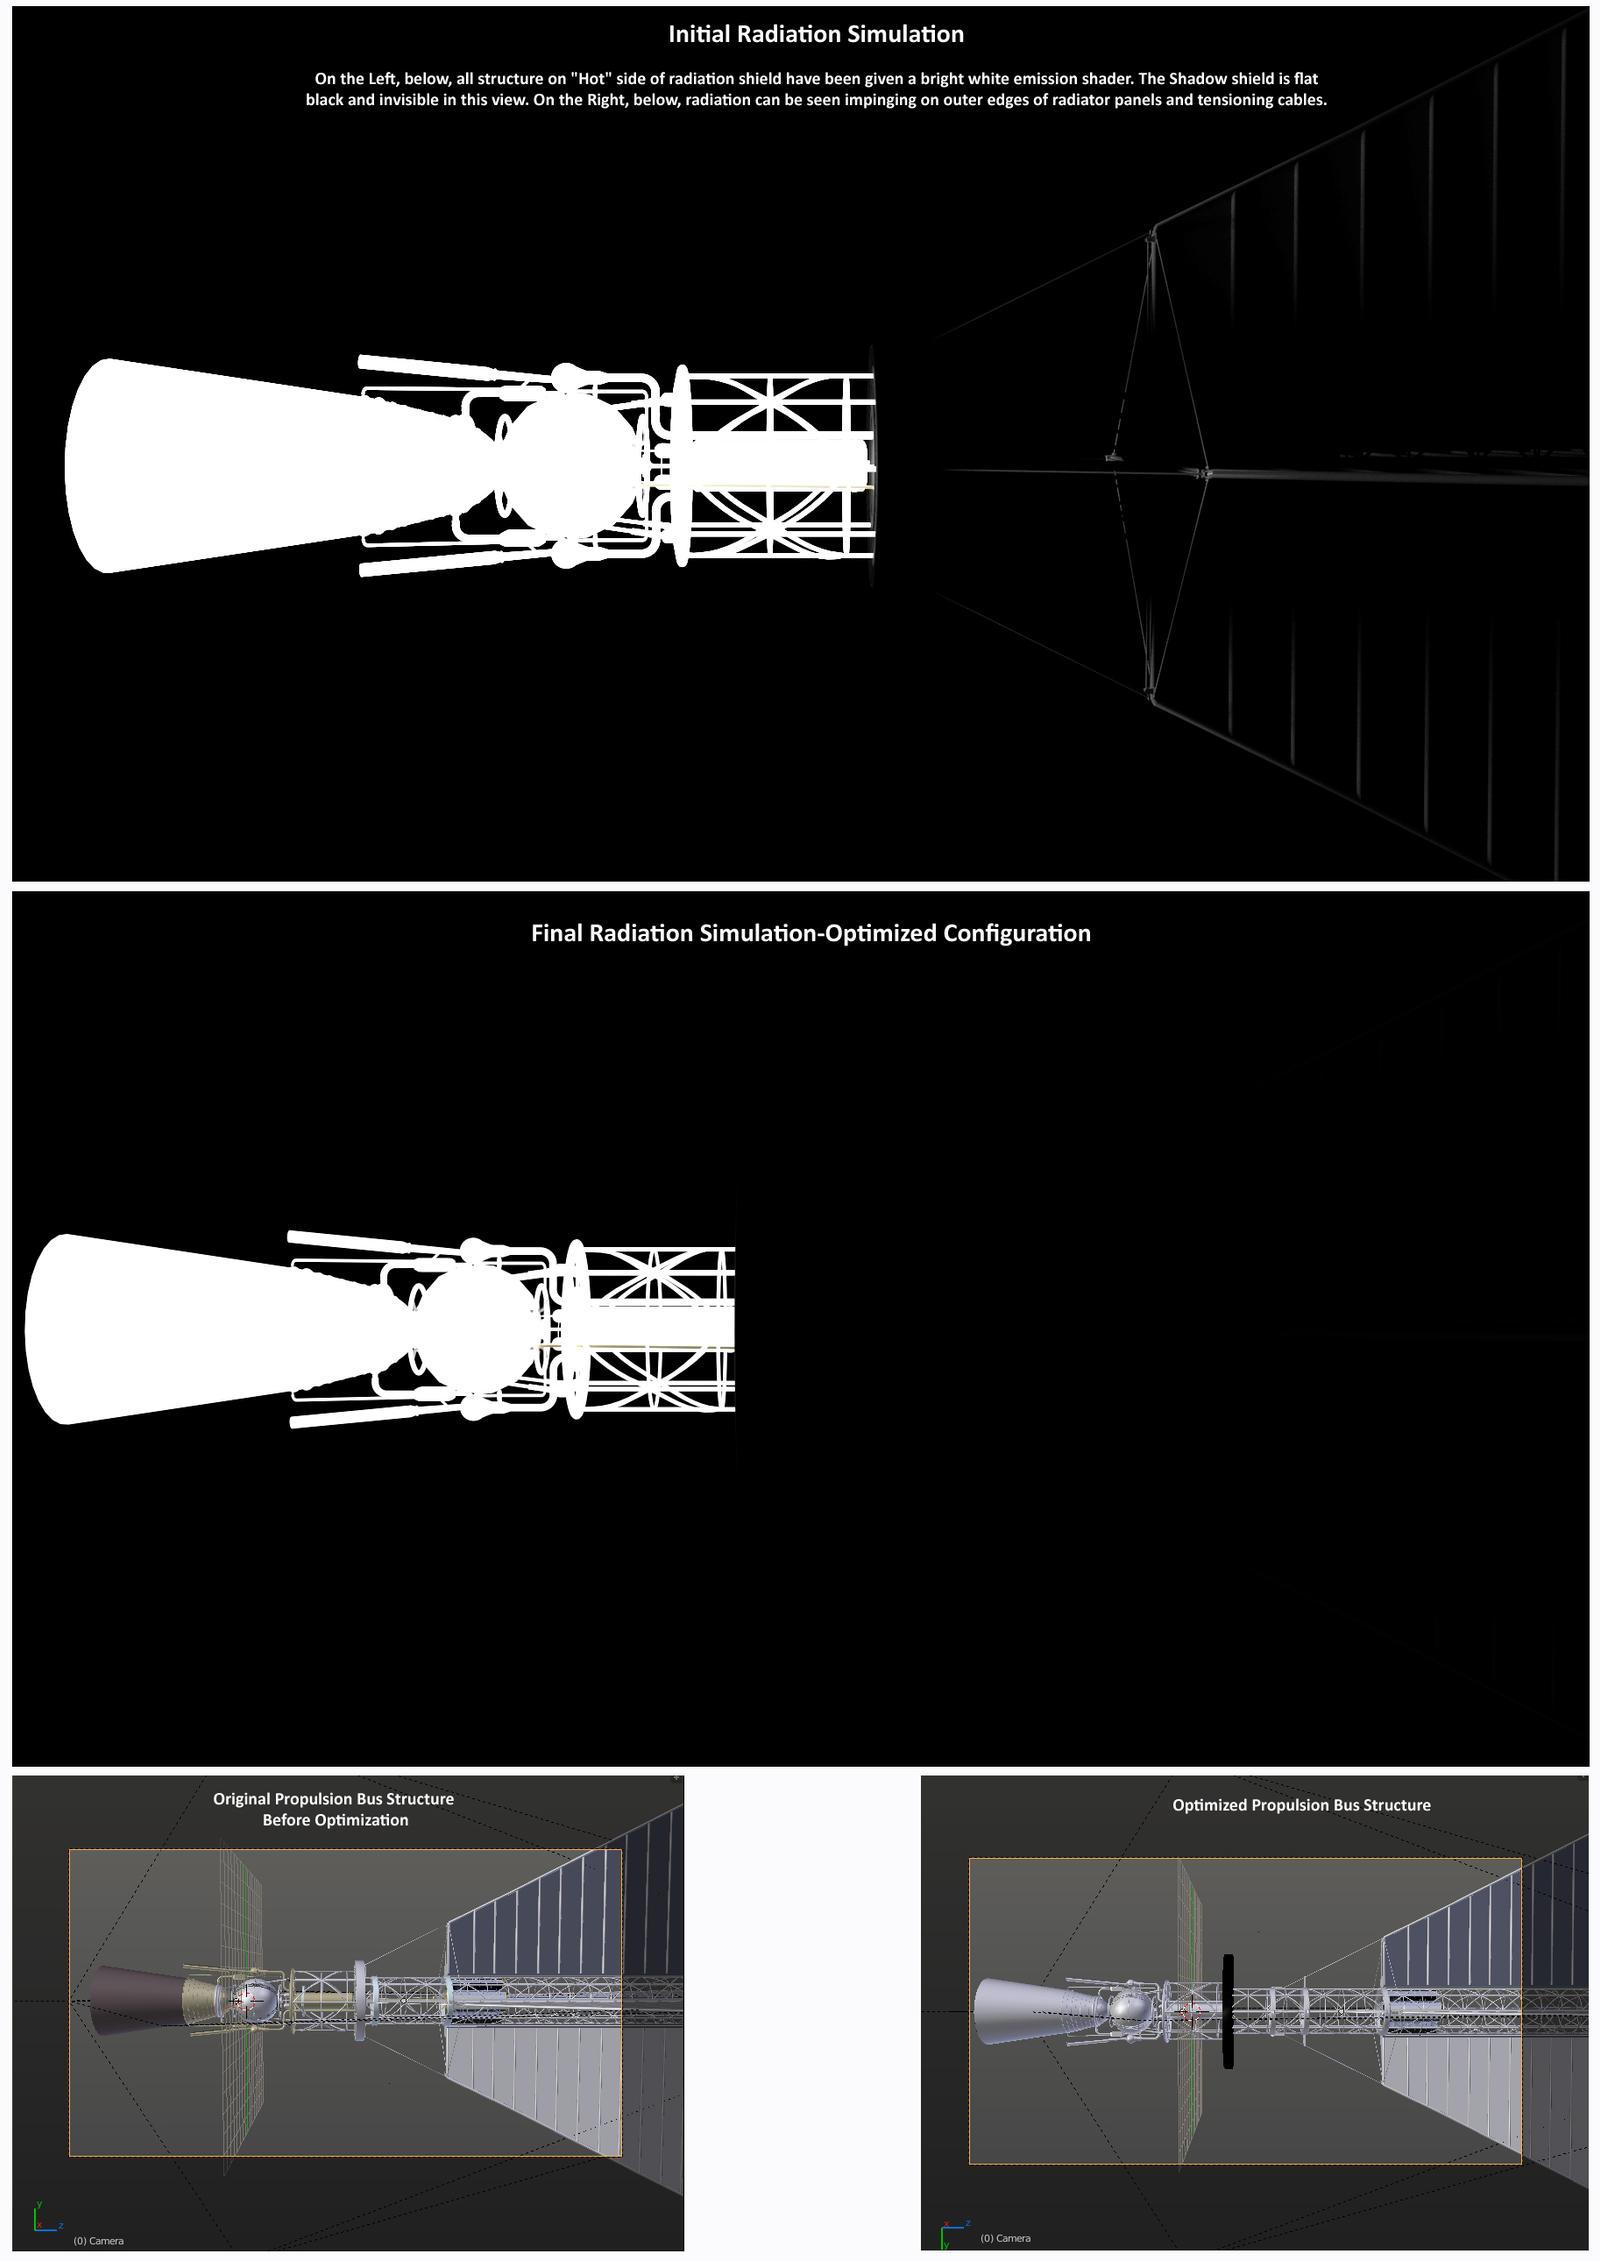 Gas Core Rocket New Radiation Simulation